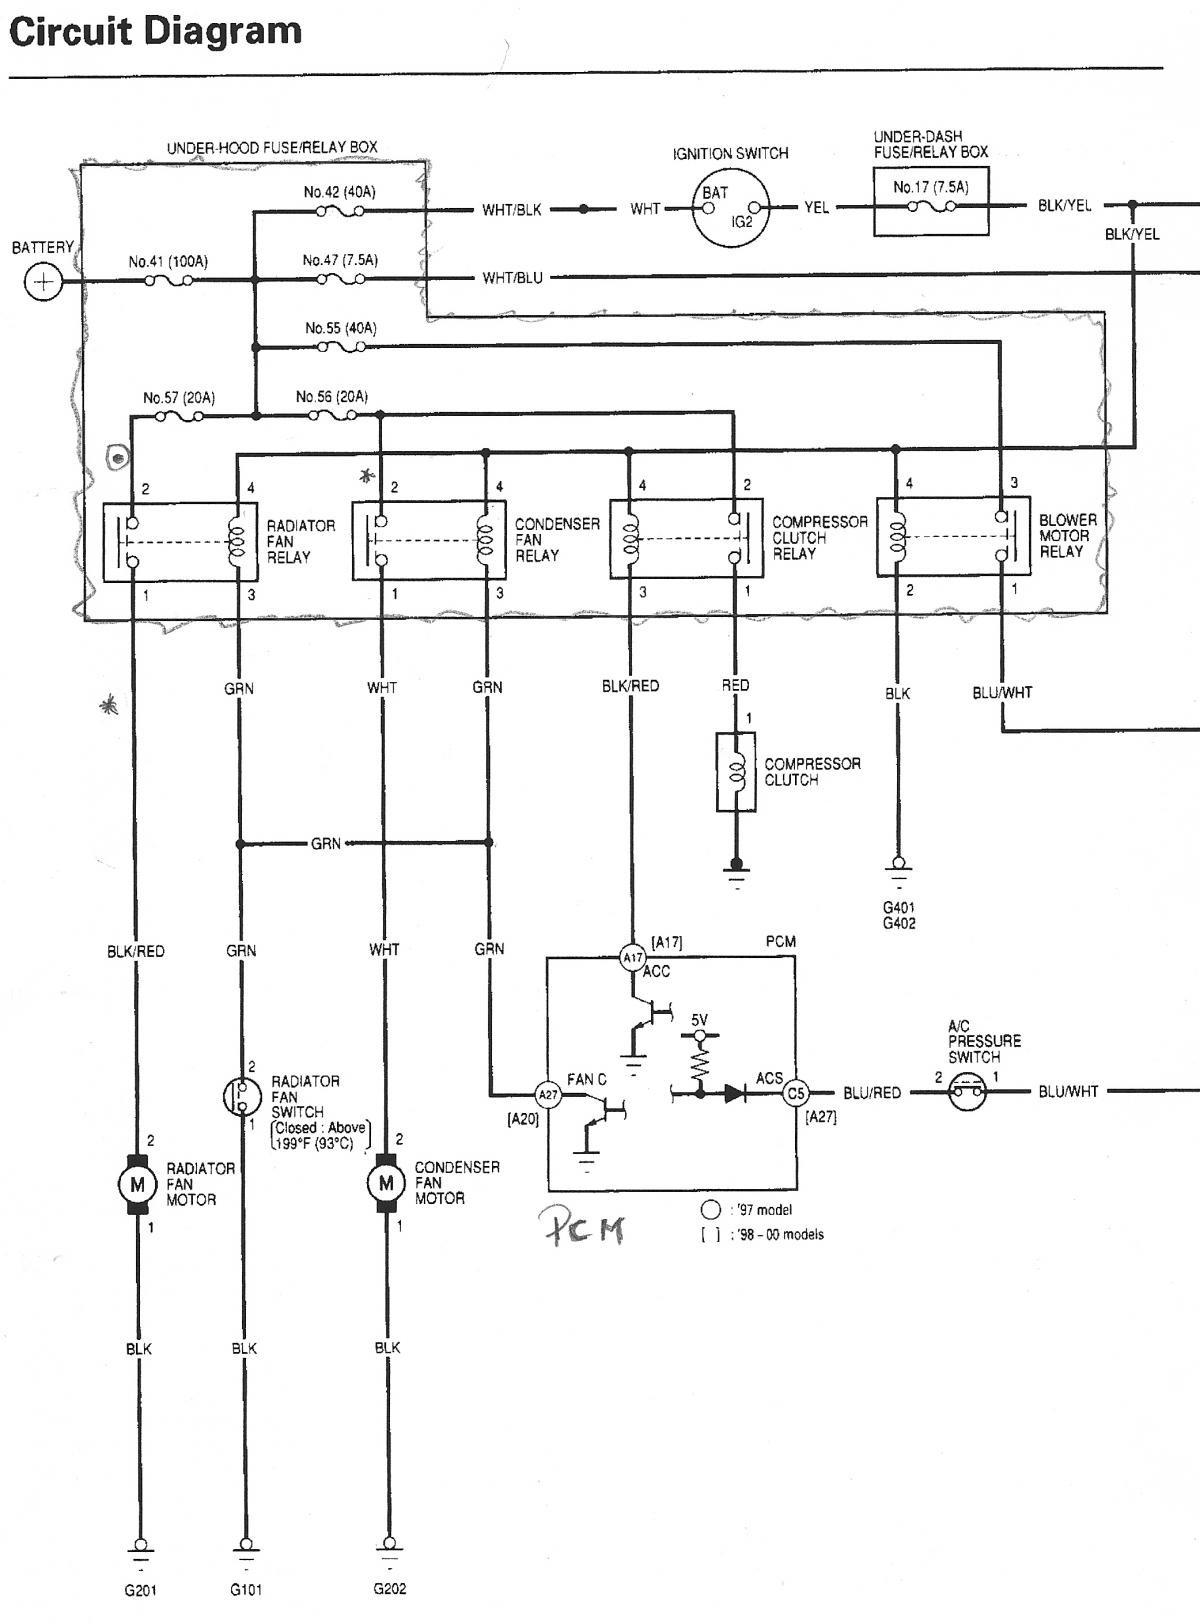 2006 Honda Civic Radio Wiring Diagram - Honda Civic